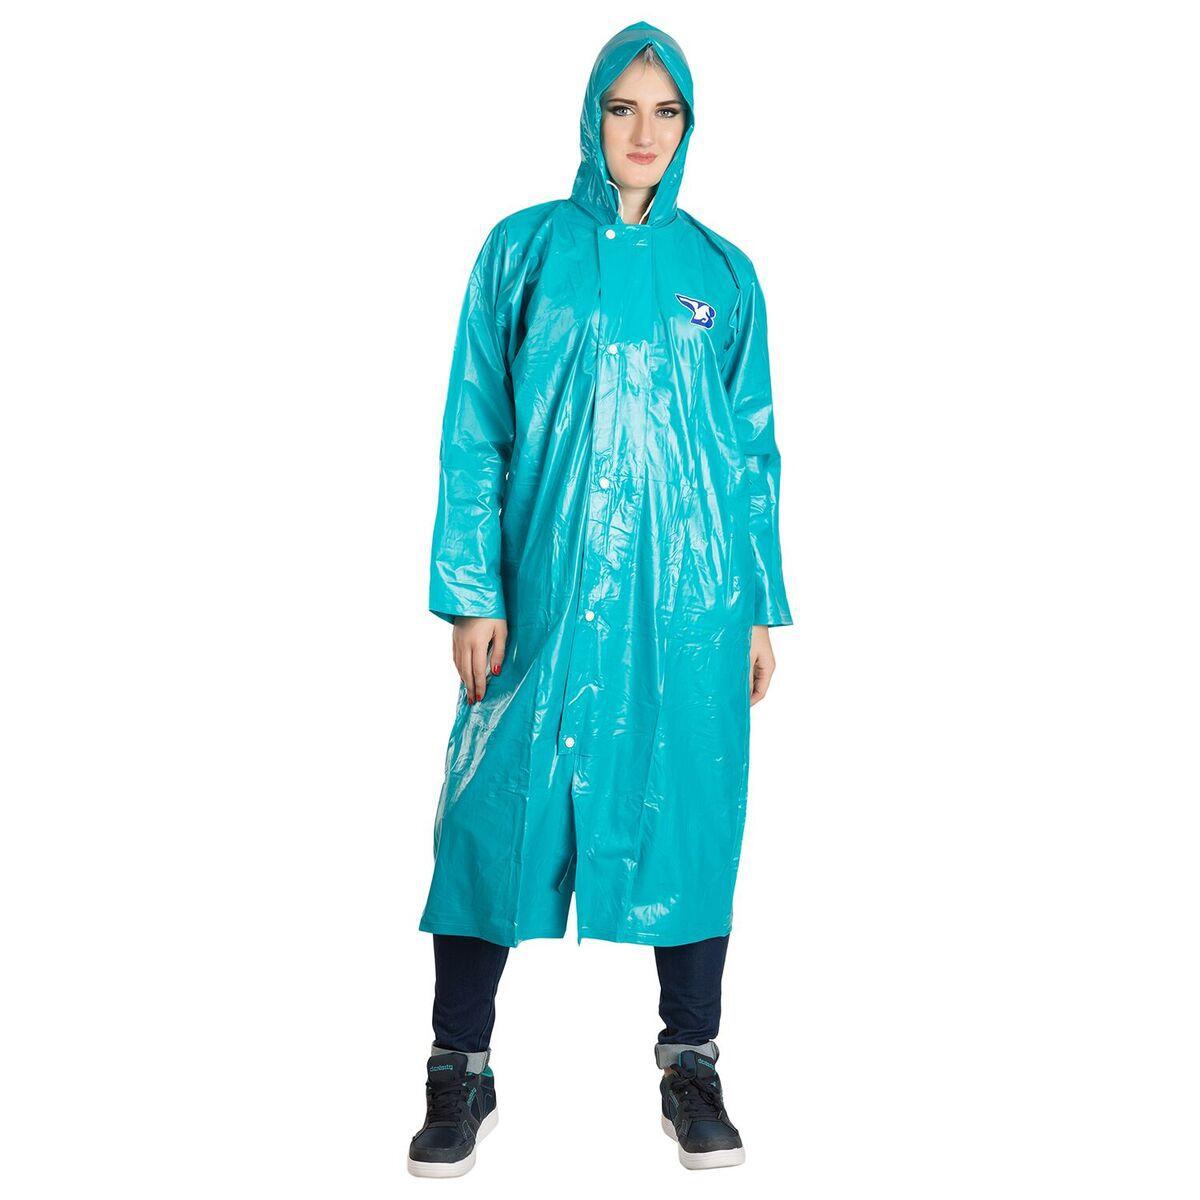 Burdy Polyester Long Raincoat - Green